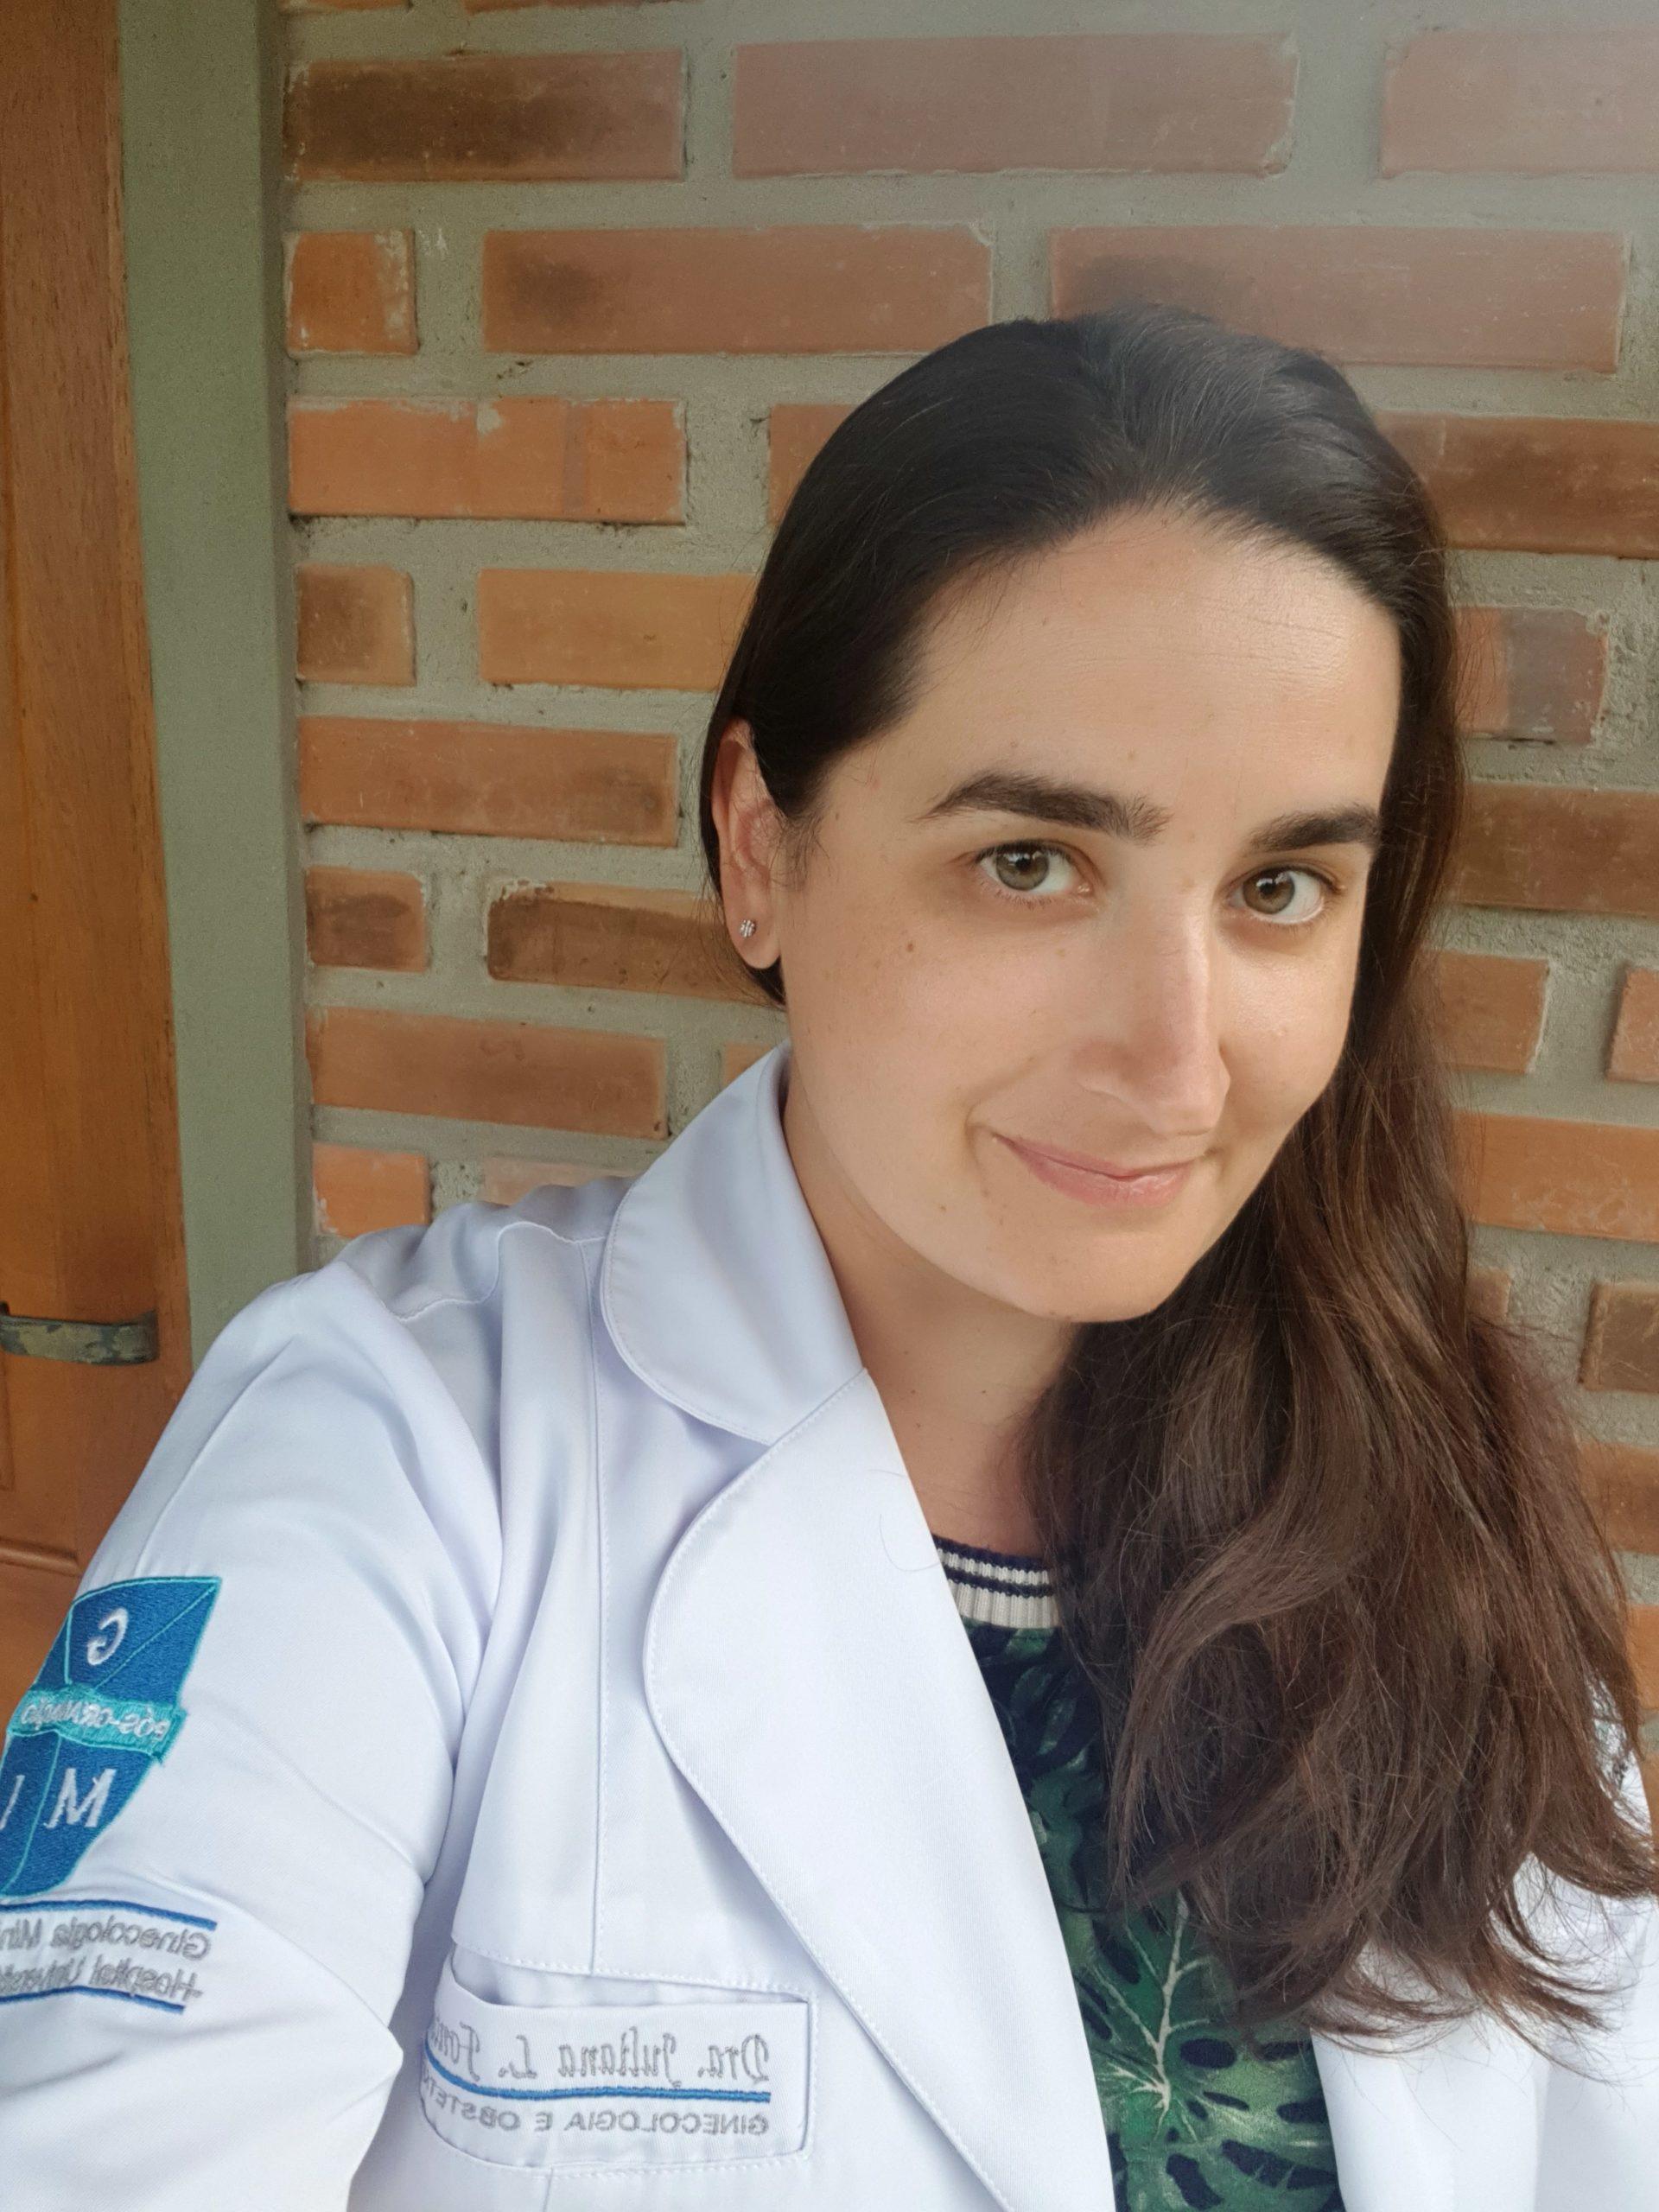 Juliana Fontoura